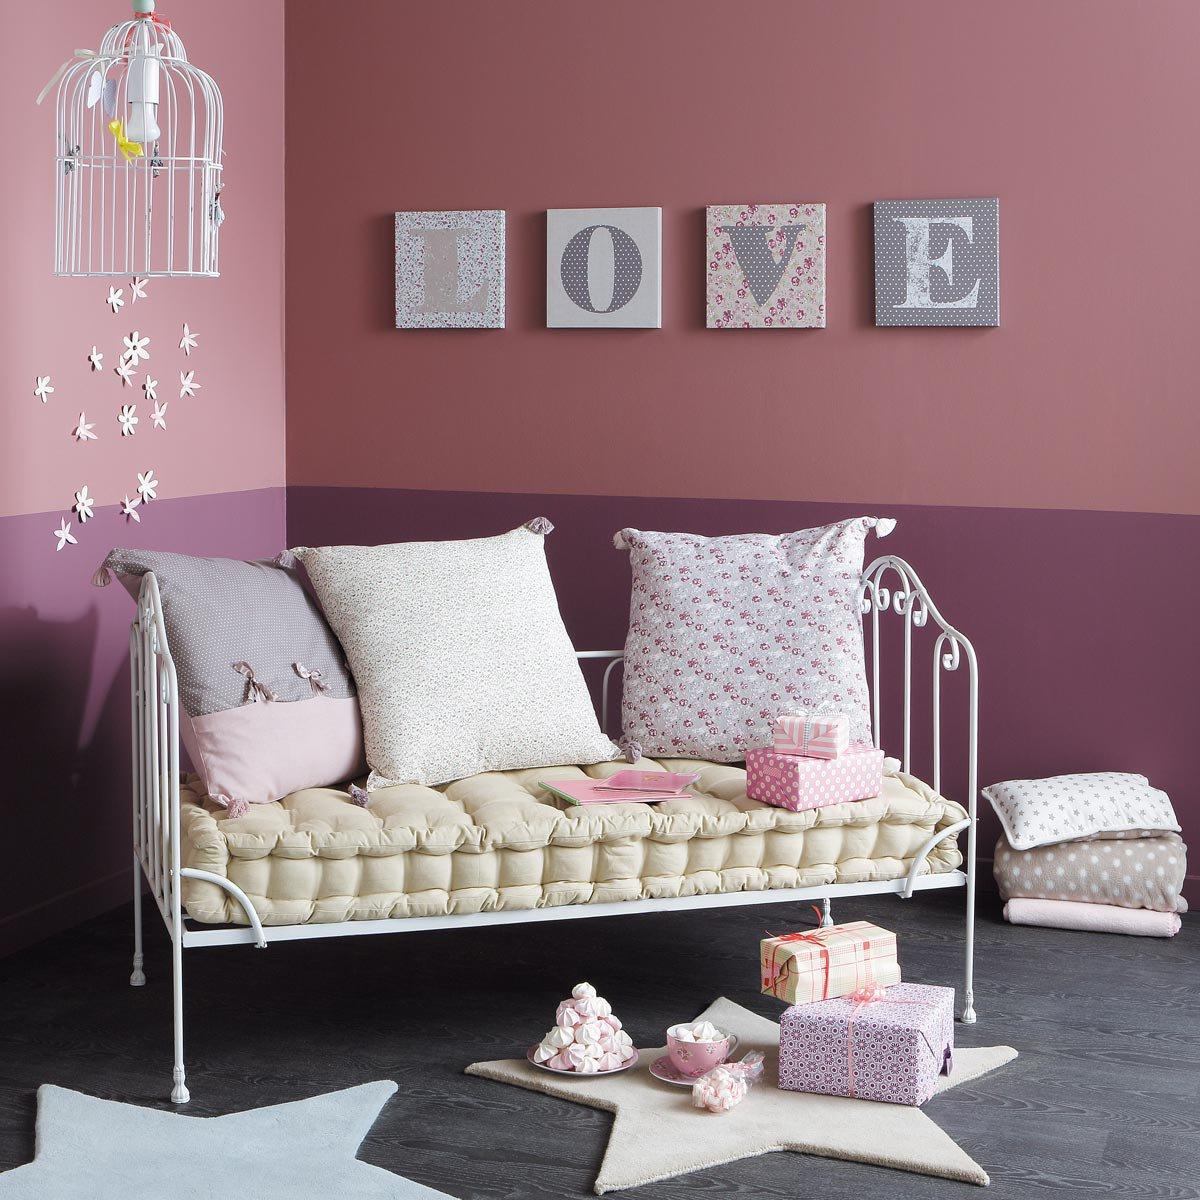 maisons du monde lance sa collection junior decocrush. Black Bedroom Furniture Sets. Home Design Ideas